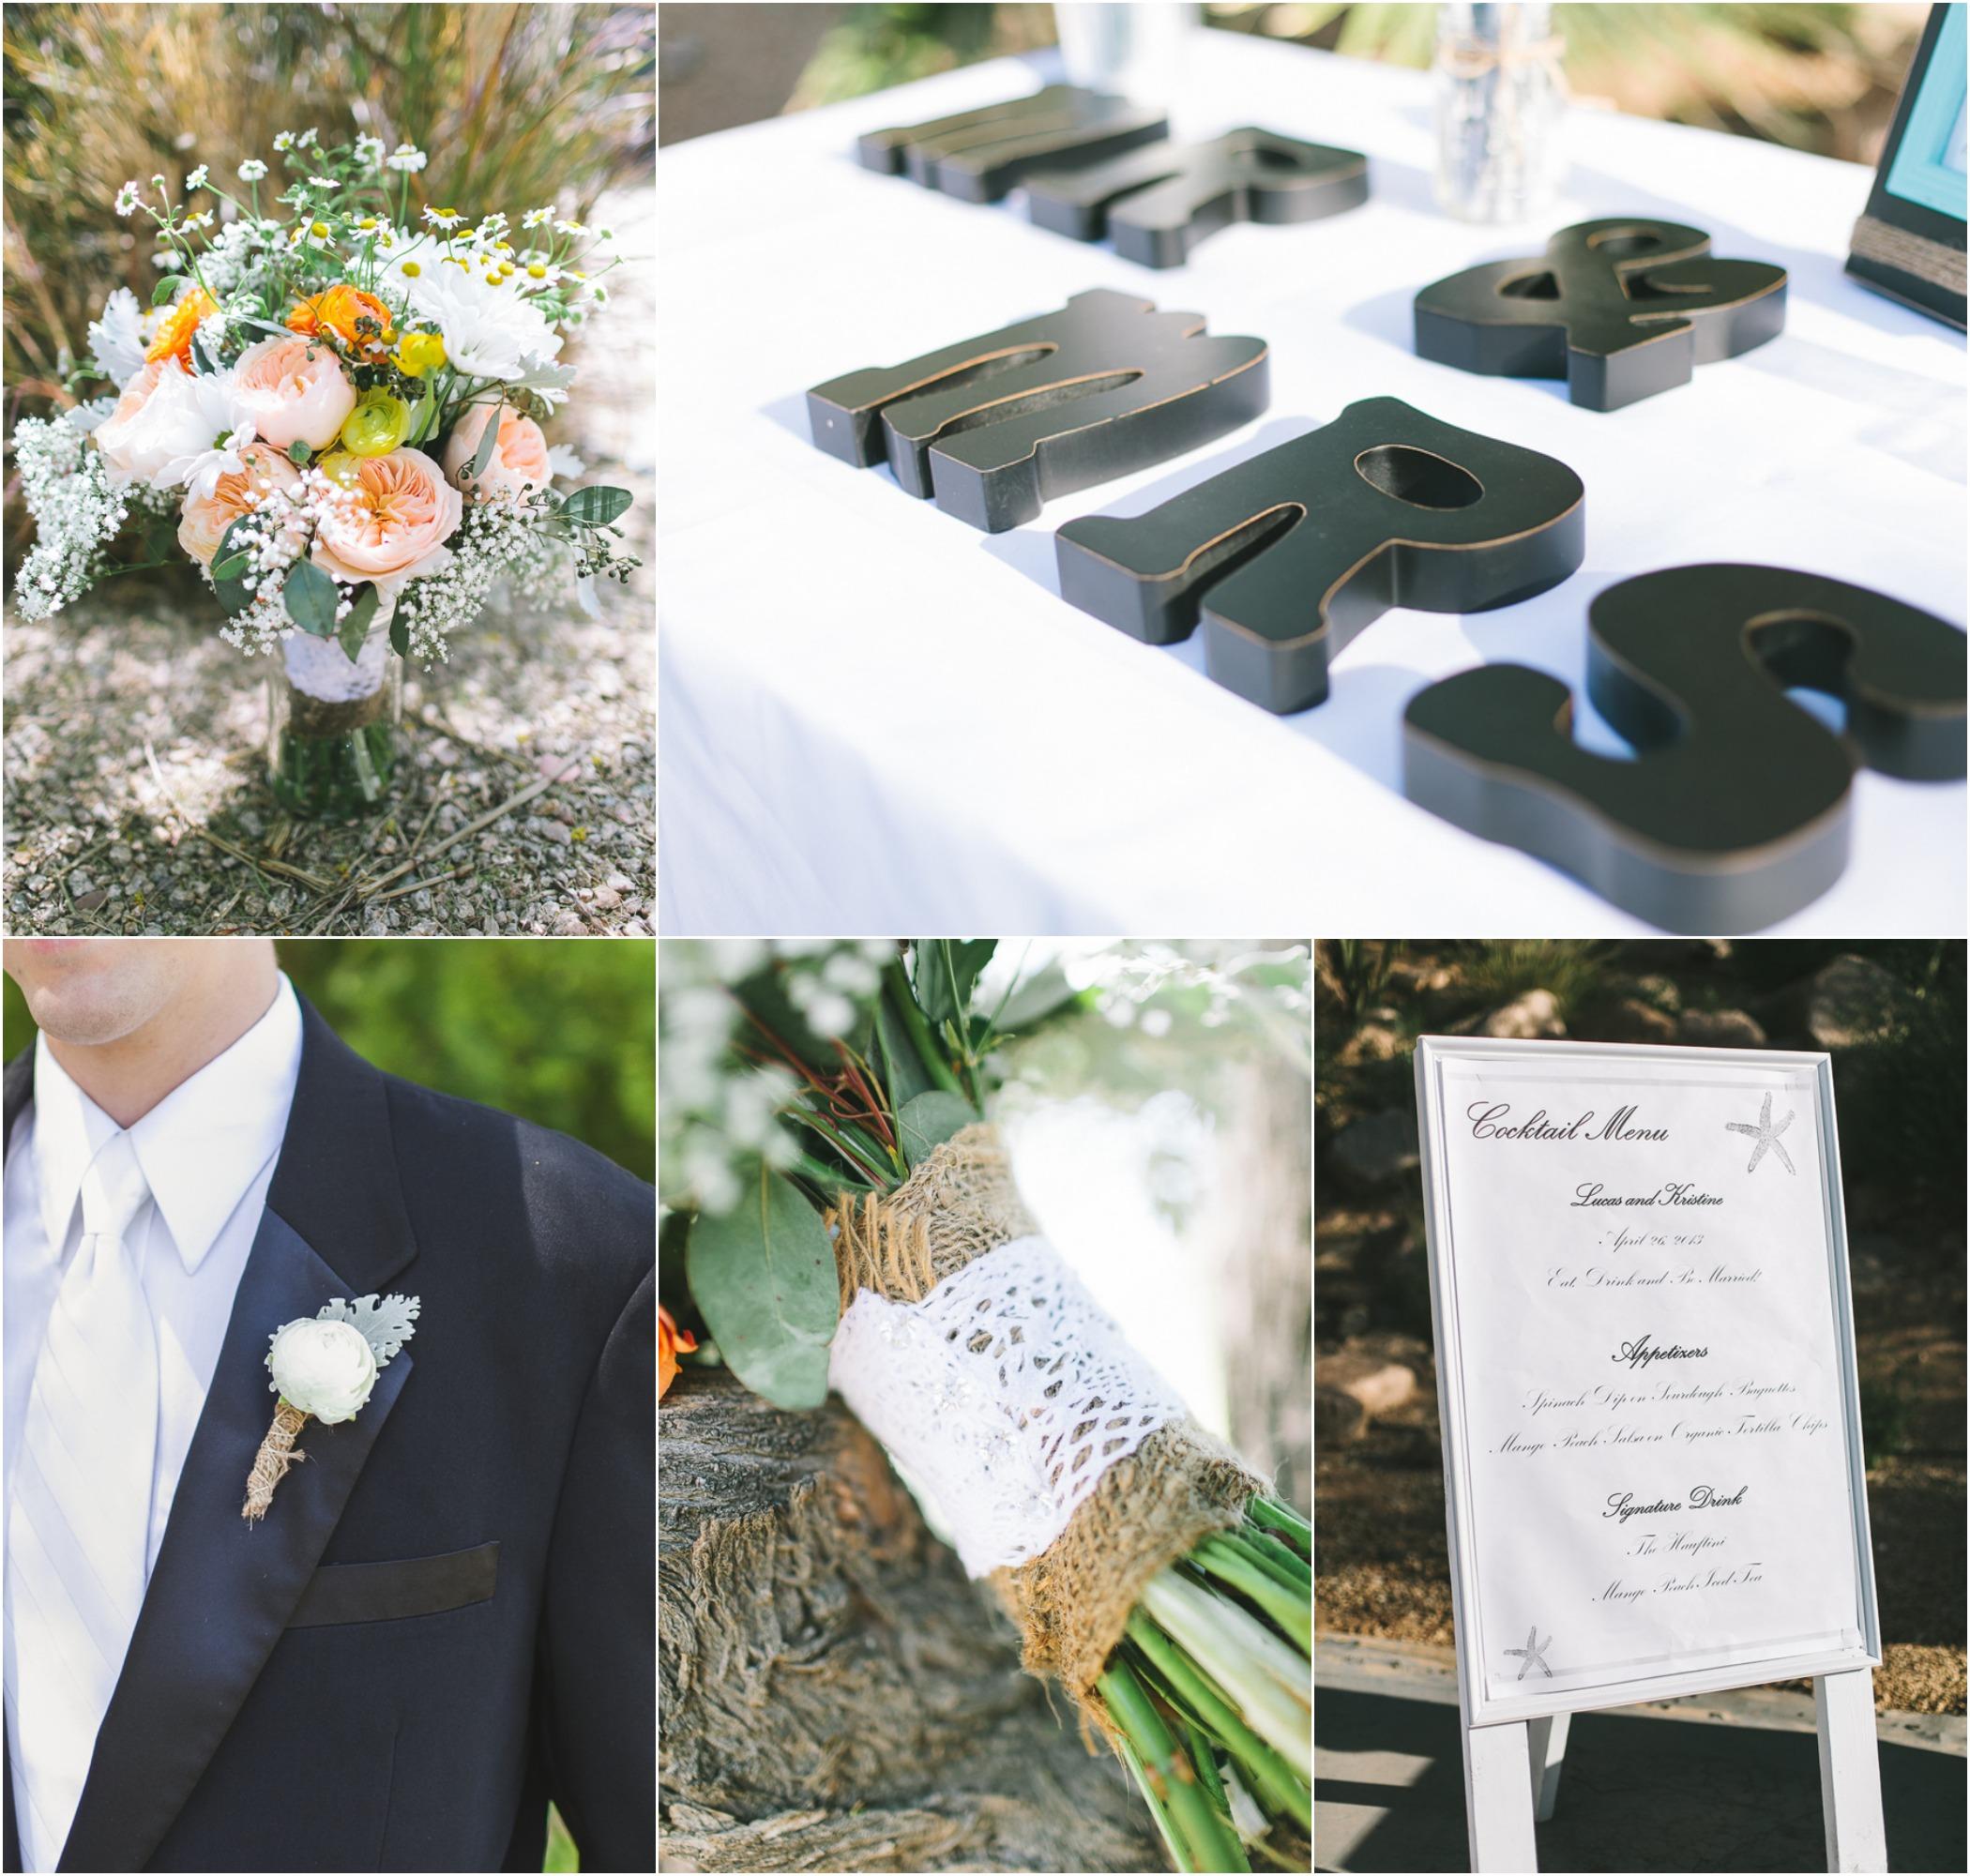 Burlap Wedding: Rustic Chic Wedding At Sanctuary Camelback Mountain